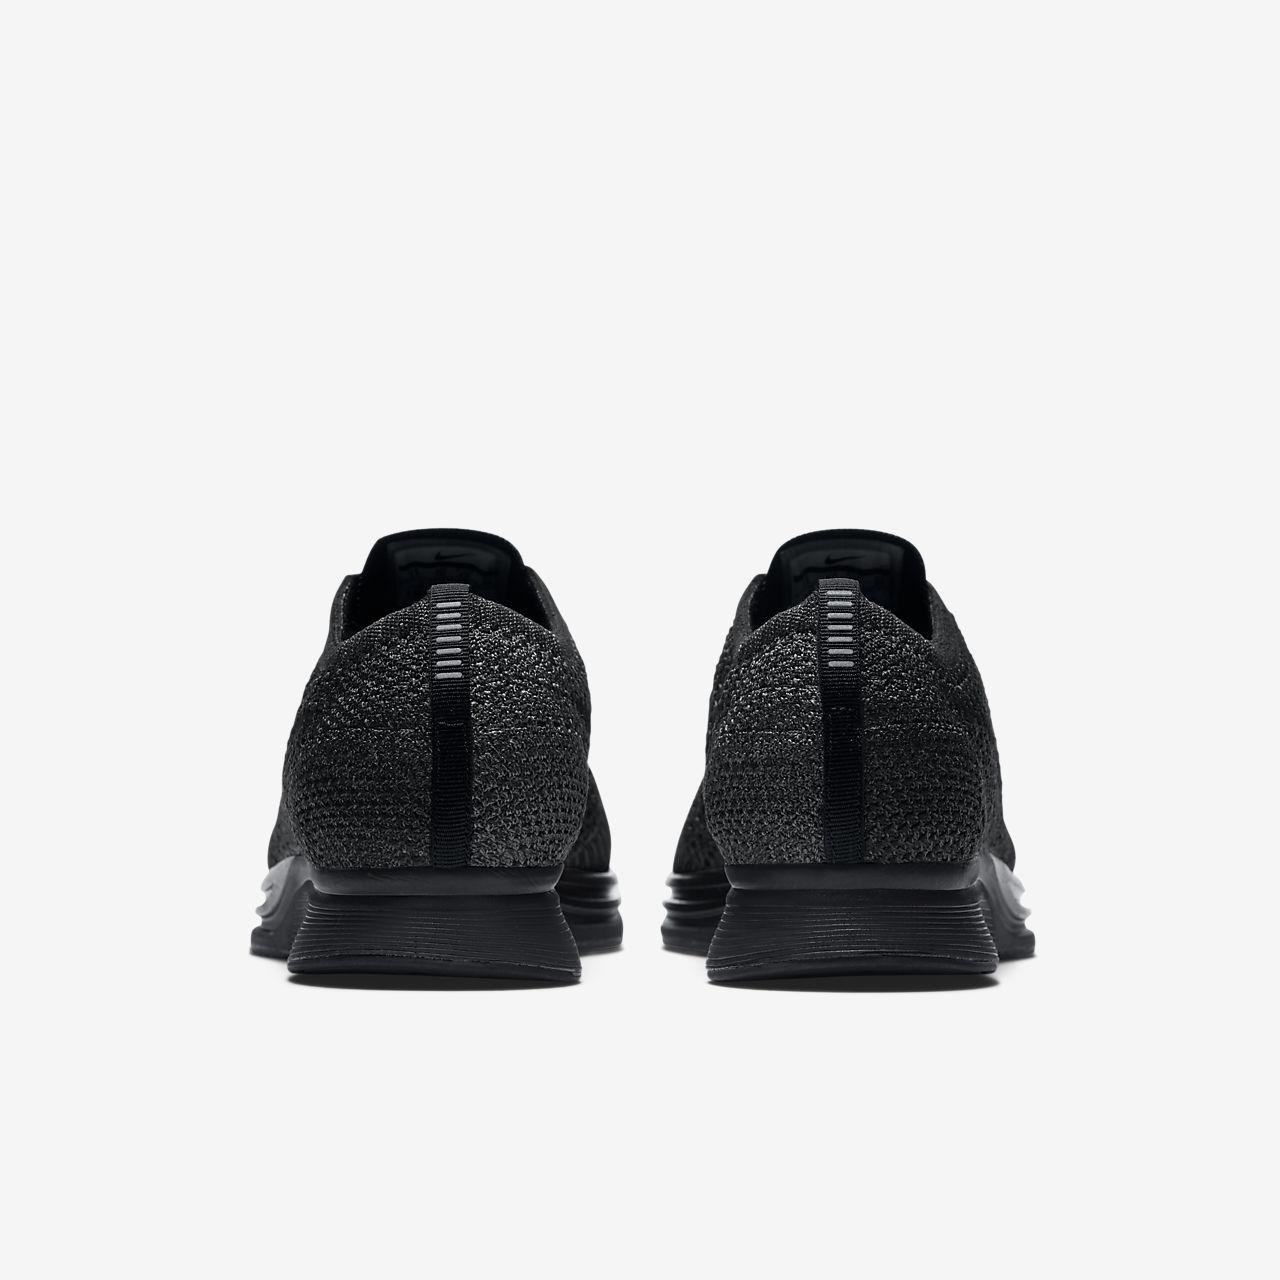 nada esqueleto Alcalde  Nike Flyknit Racer Unisex Running Shoes Black Blackout Anthracite 526628  009 NEW Nike Flyknit Men's Shoes Men's Athletic Shoes